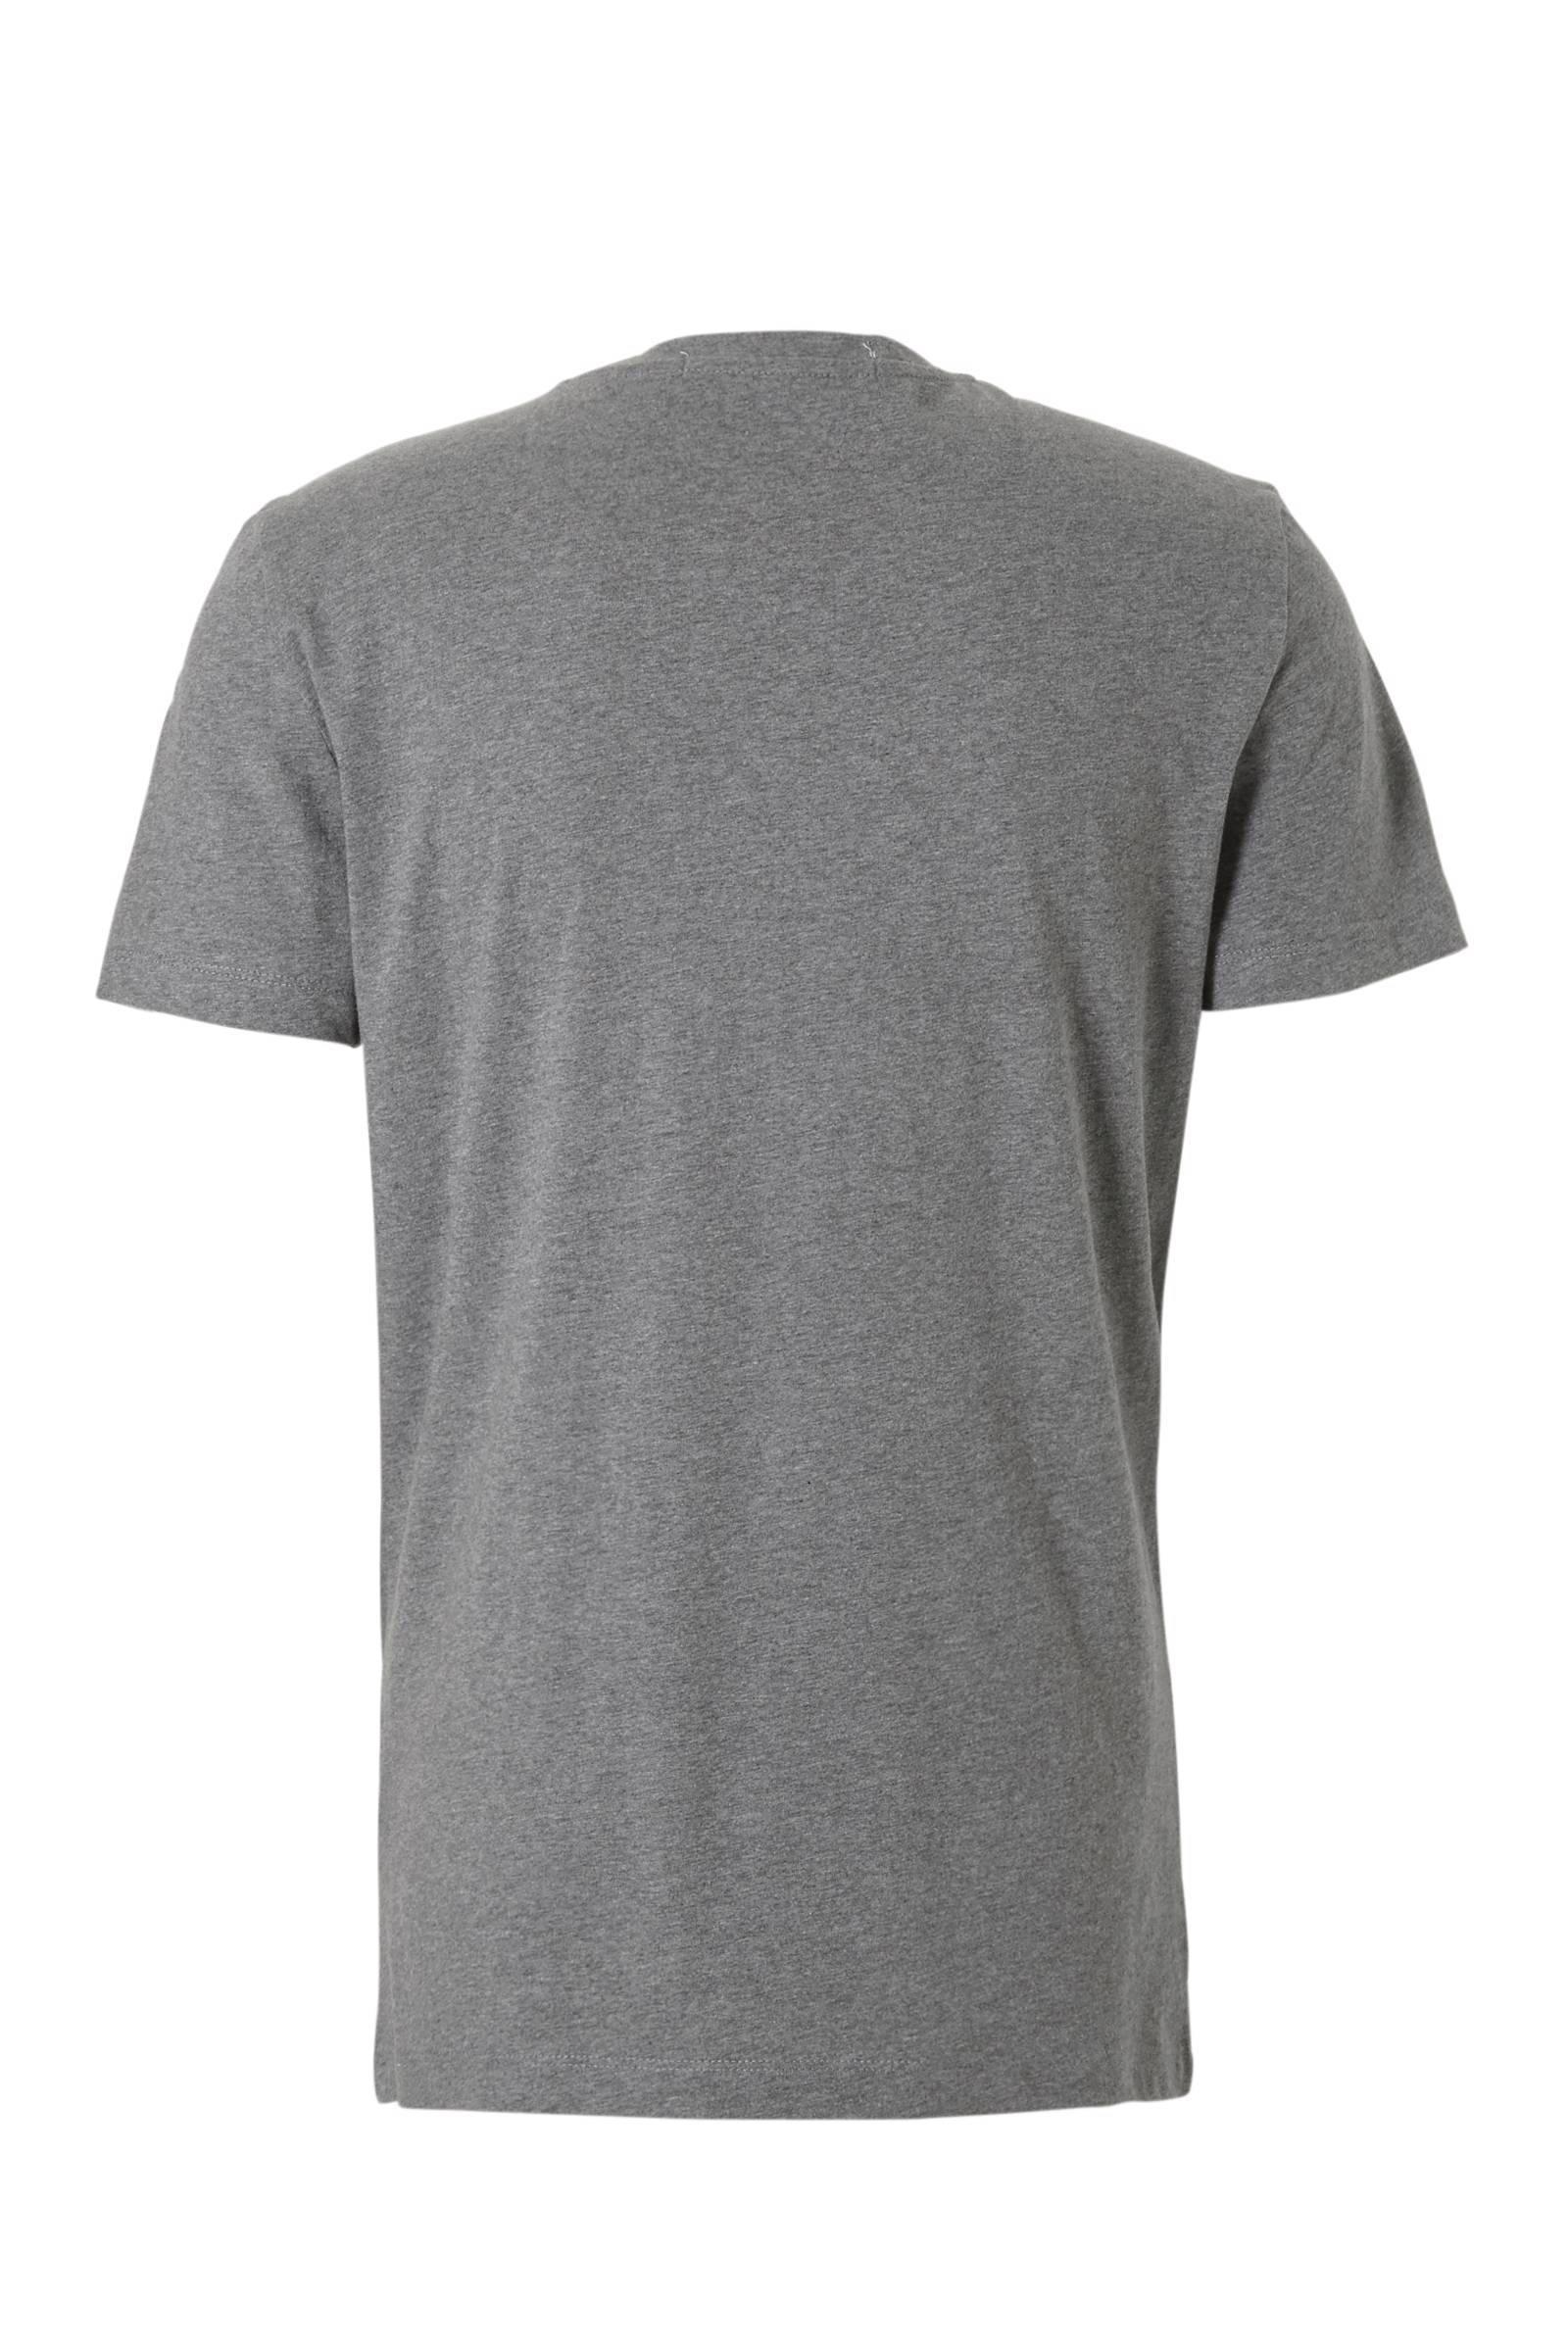 Jeans Calvin shirt T Klein Calvin Klein Jeans Jeans shirt T T shirt Calvin Klein 5Xqwa48